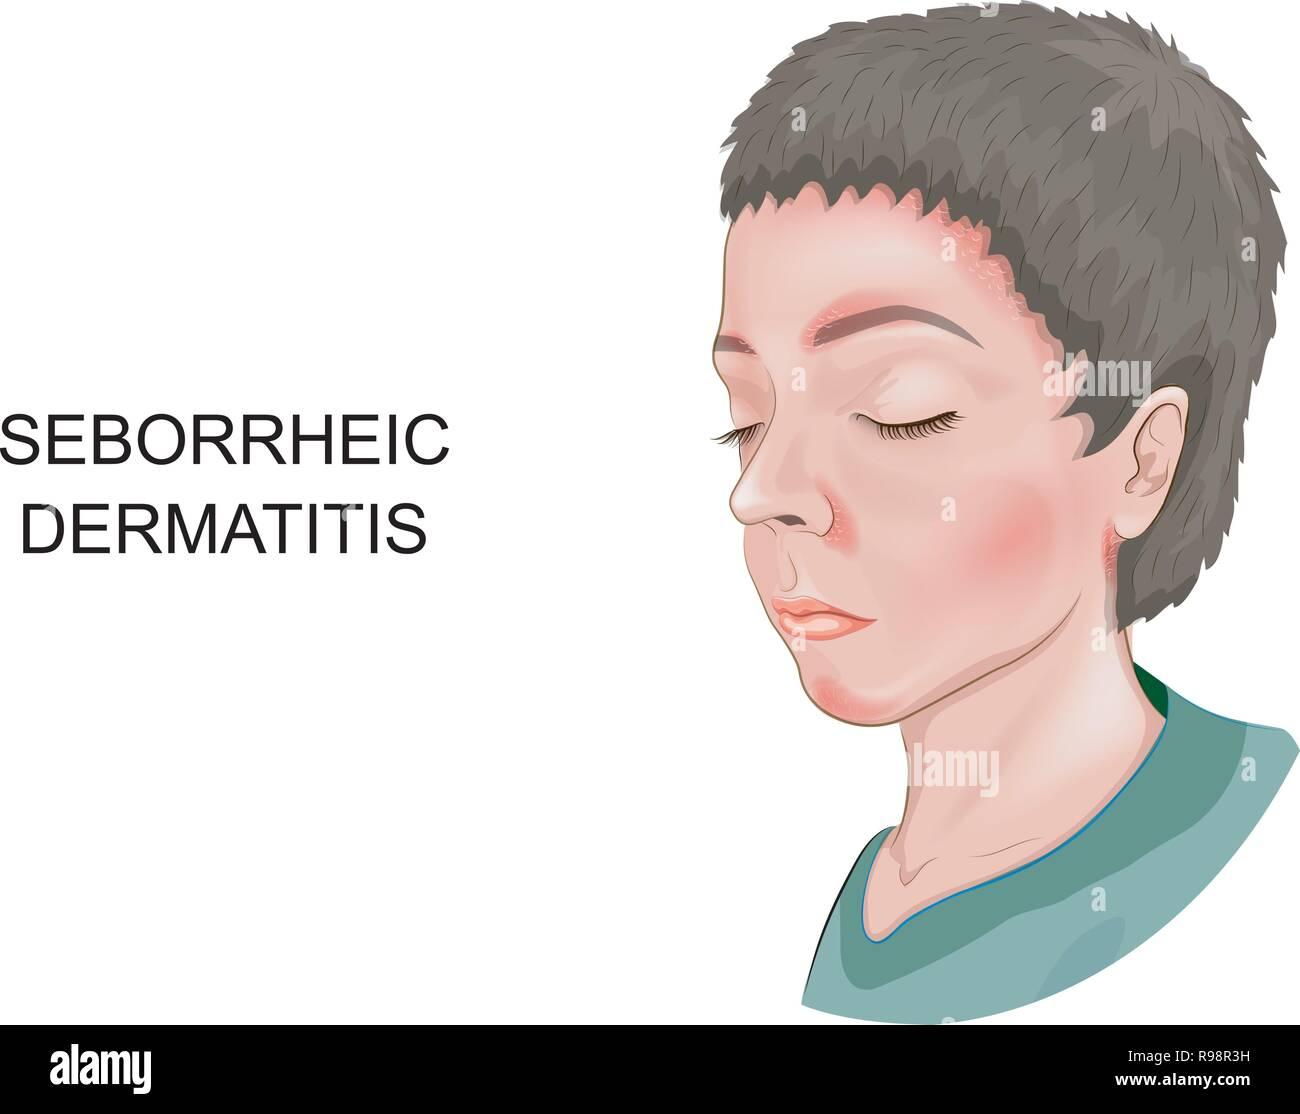 Seborrheic Dermatitis Stock Photos & Seborrheic Dermatitis